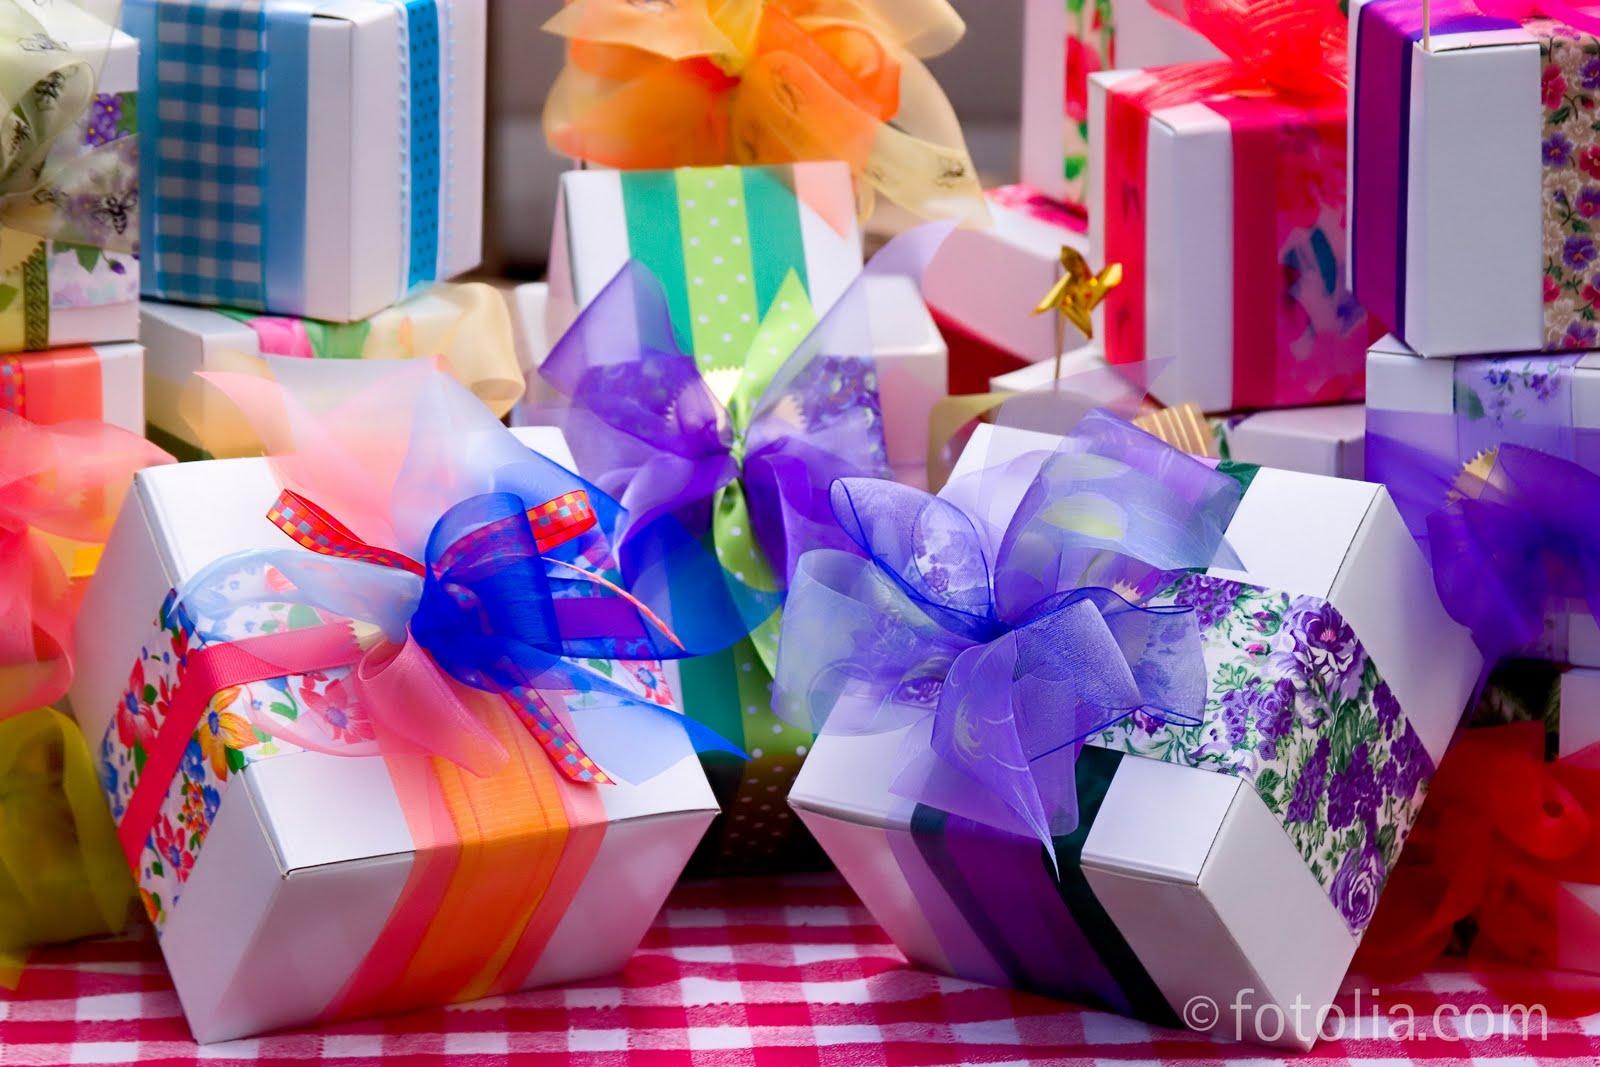 http://3.bp.blogspot.com/_QZHWxDatRag/TTRxWcCXu6I/AAAAAAAAAIQ/v-KPCFeovl8/s1600/Birthday_Presents.jpg